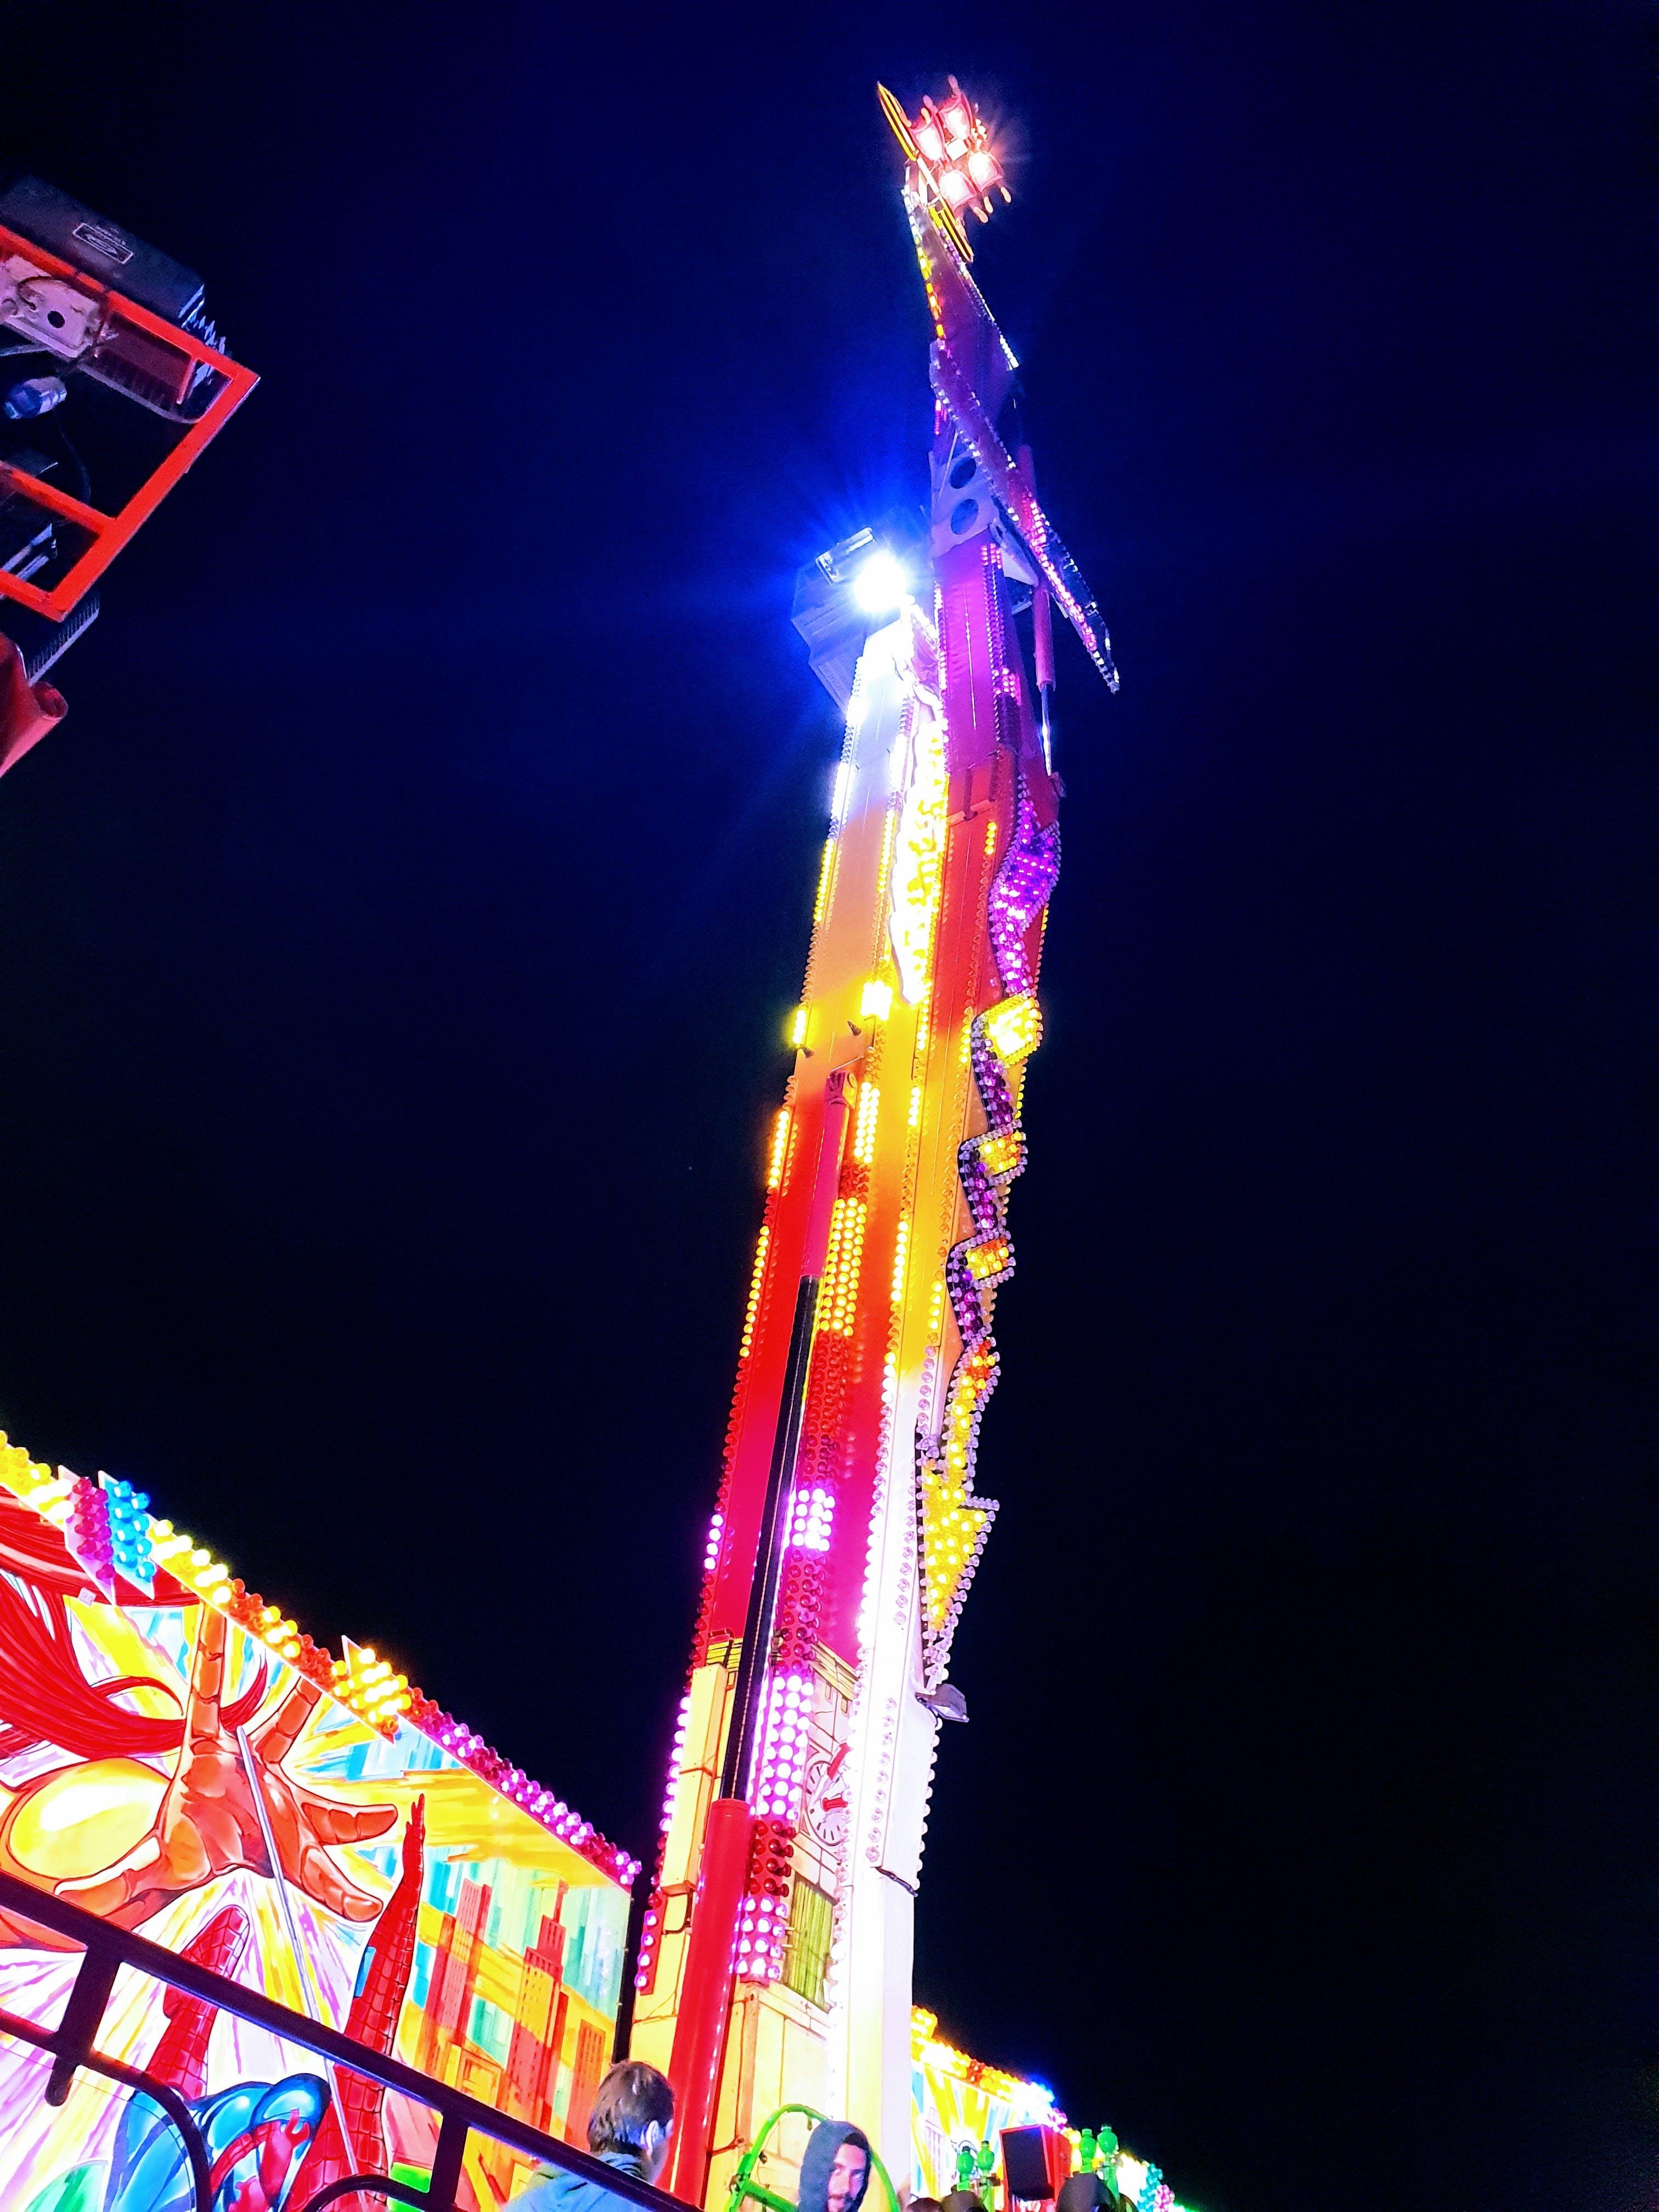 Free stock photo of funfair